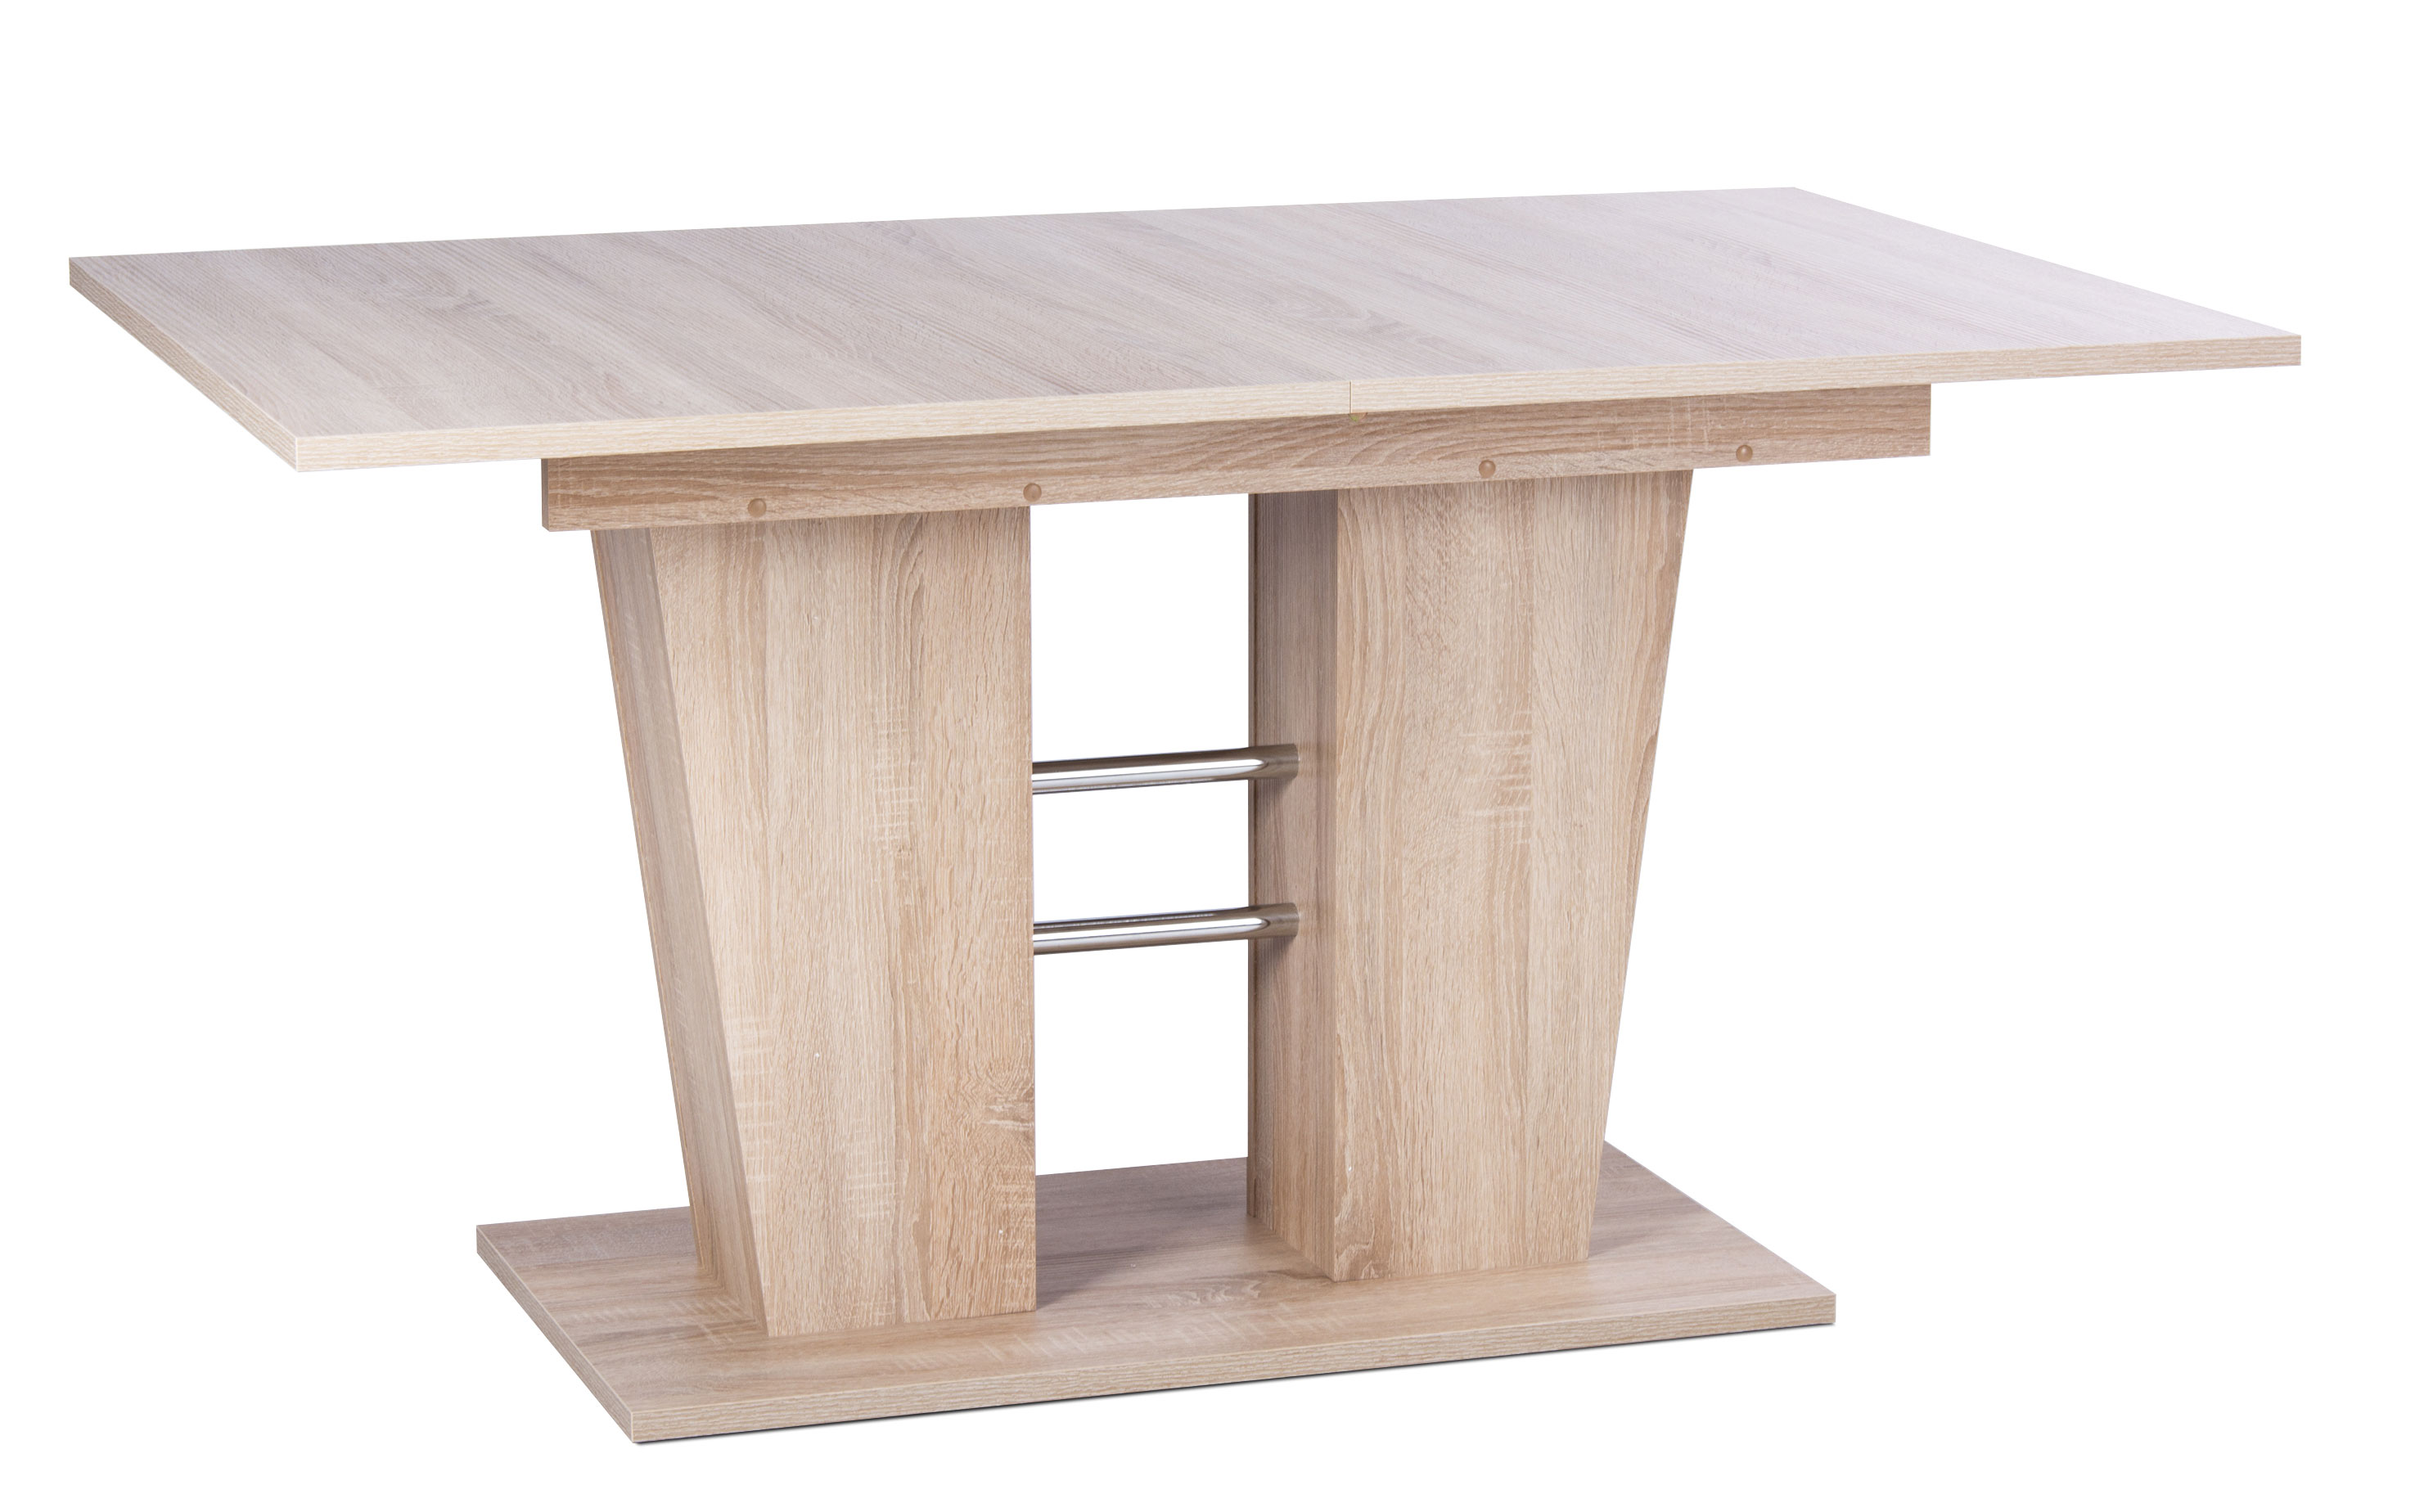 Table De Salle A Manger Extensible Design Coloris Chene Sonoma